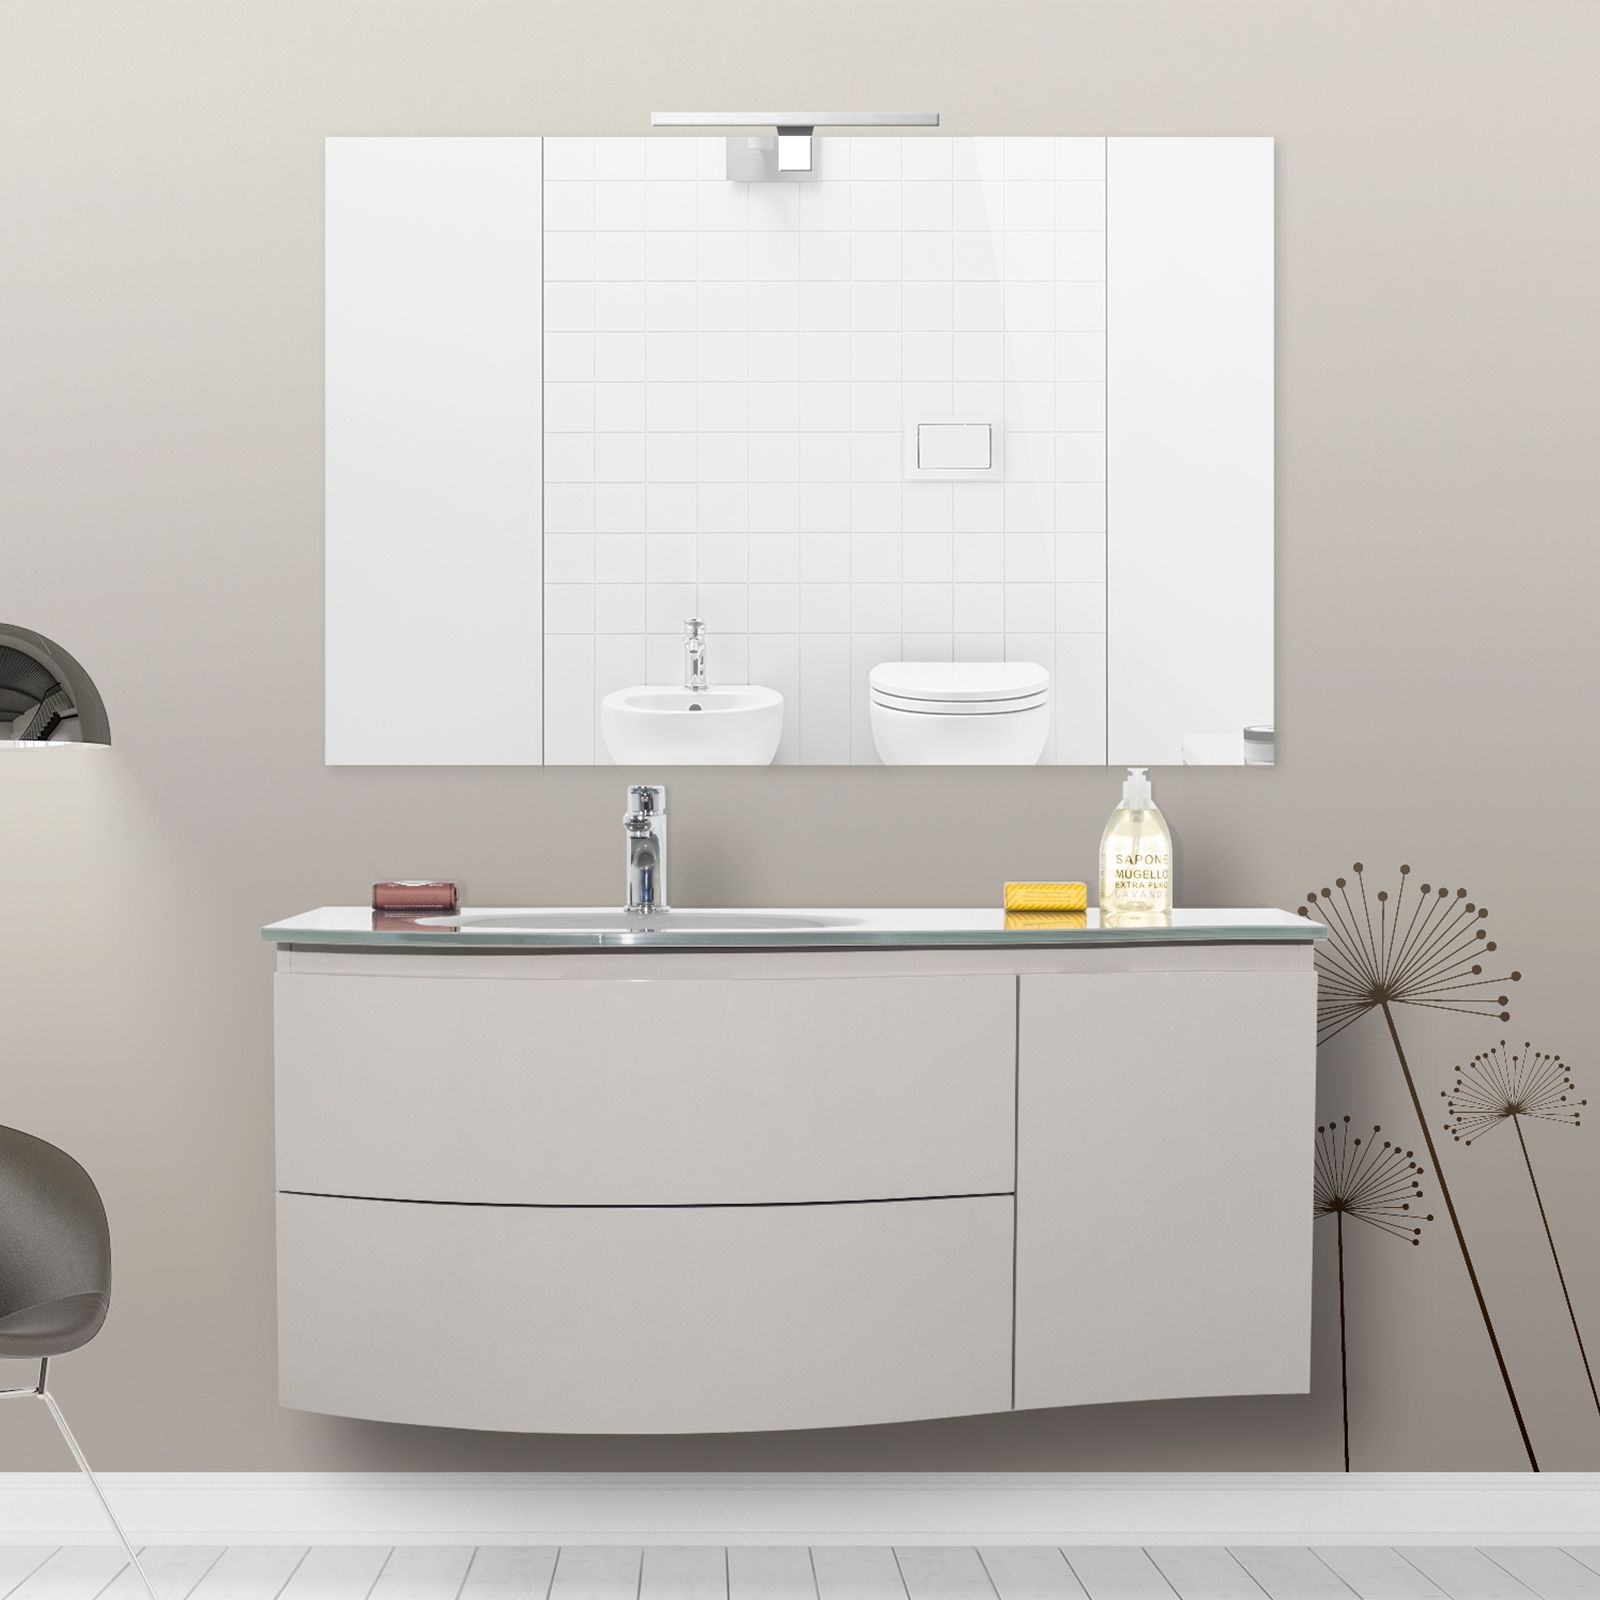 Mobile arredo da bagno 110 cm lavabo in cristallo for Arredo bagno mobili senza lavabo